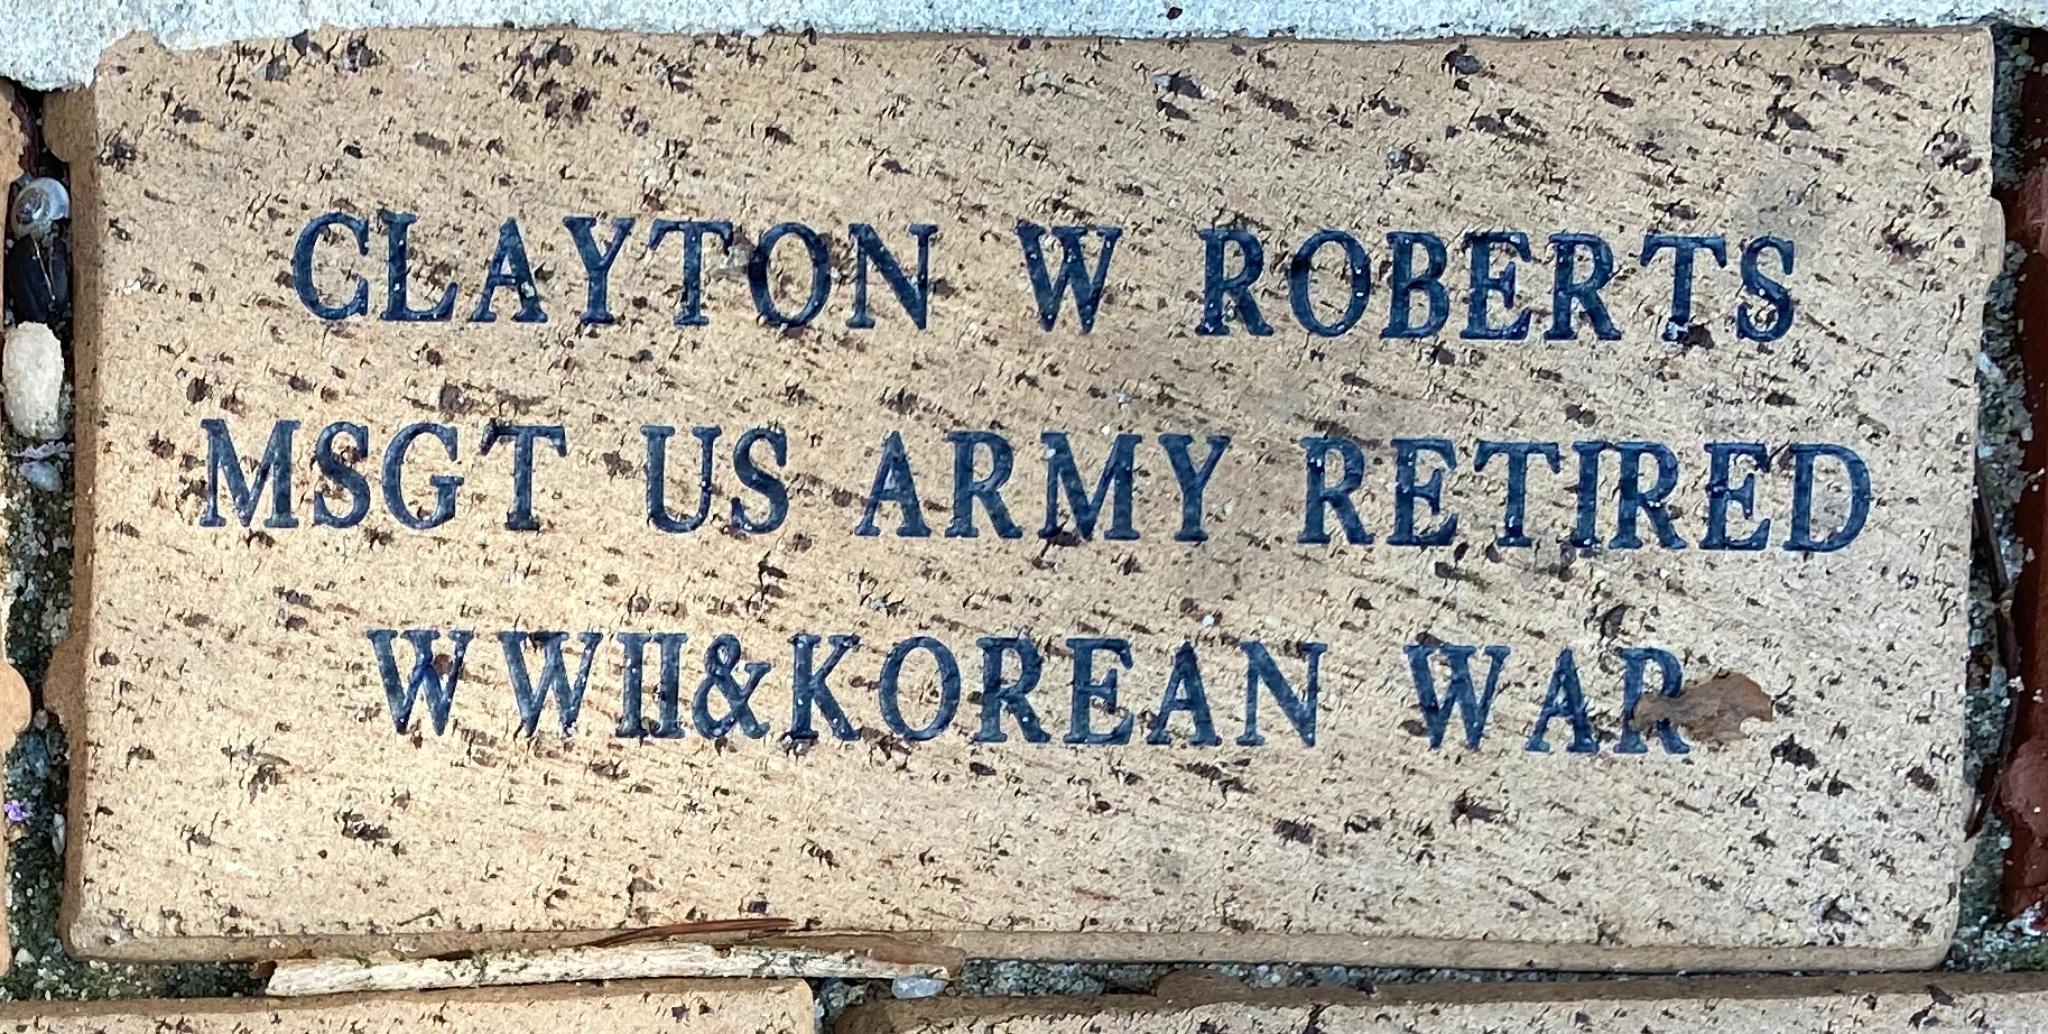 CLAYTON W ROBERTS MSGT US ARMY RETIRED WWII&KOREAN WAR